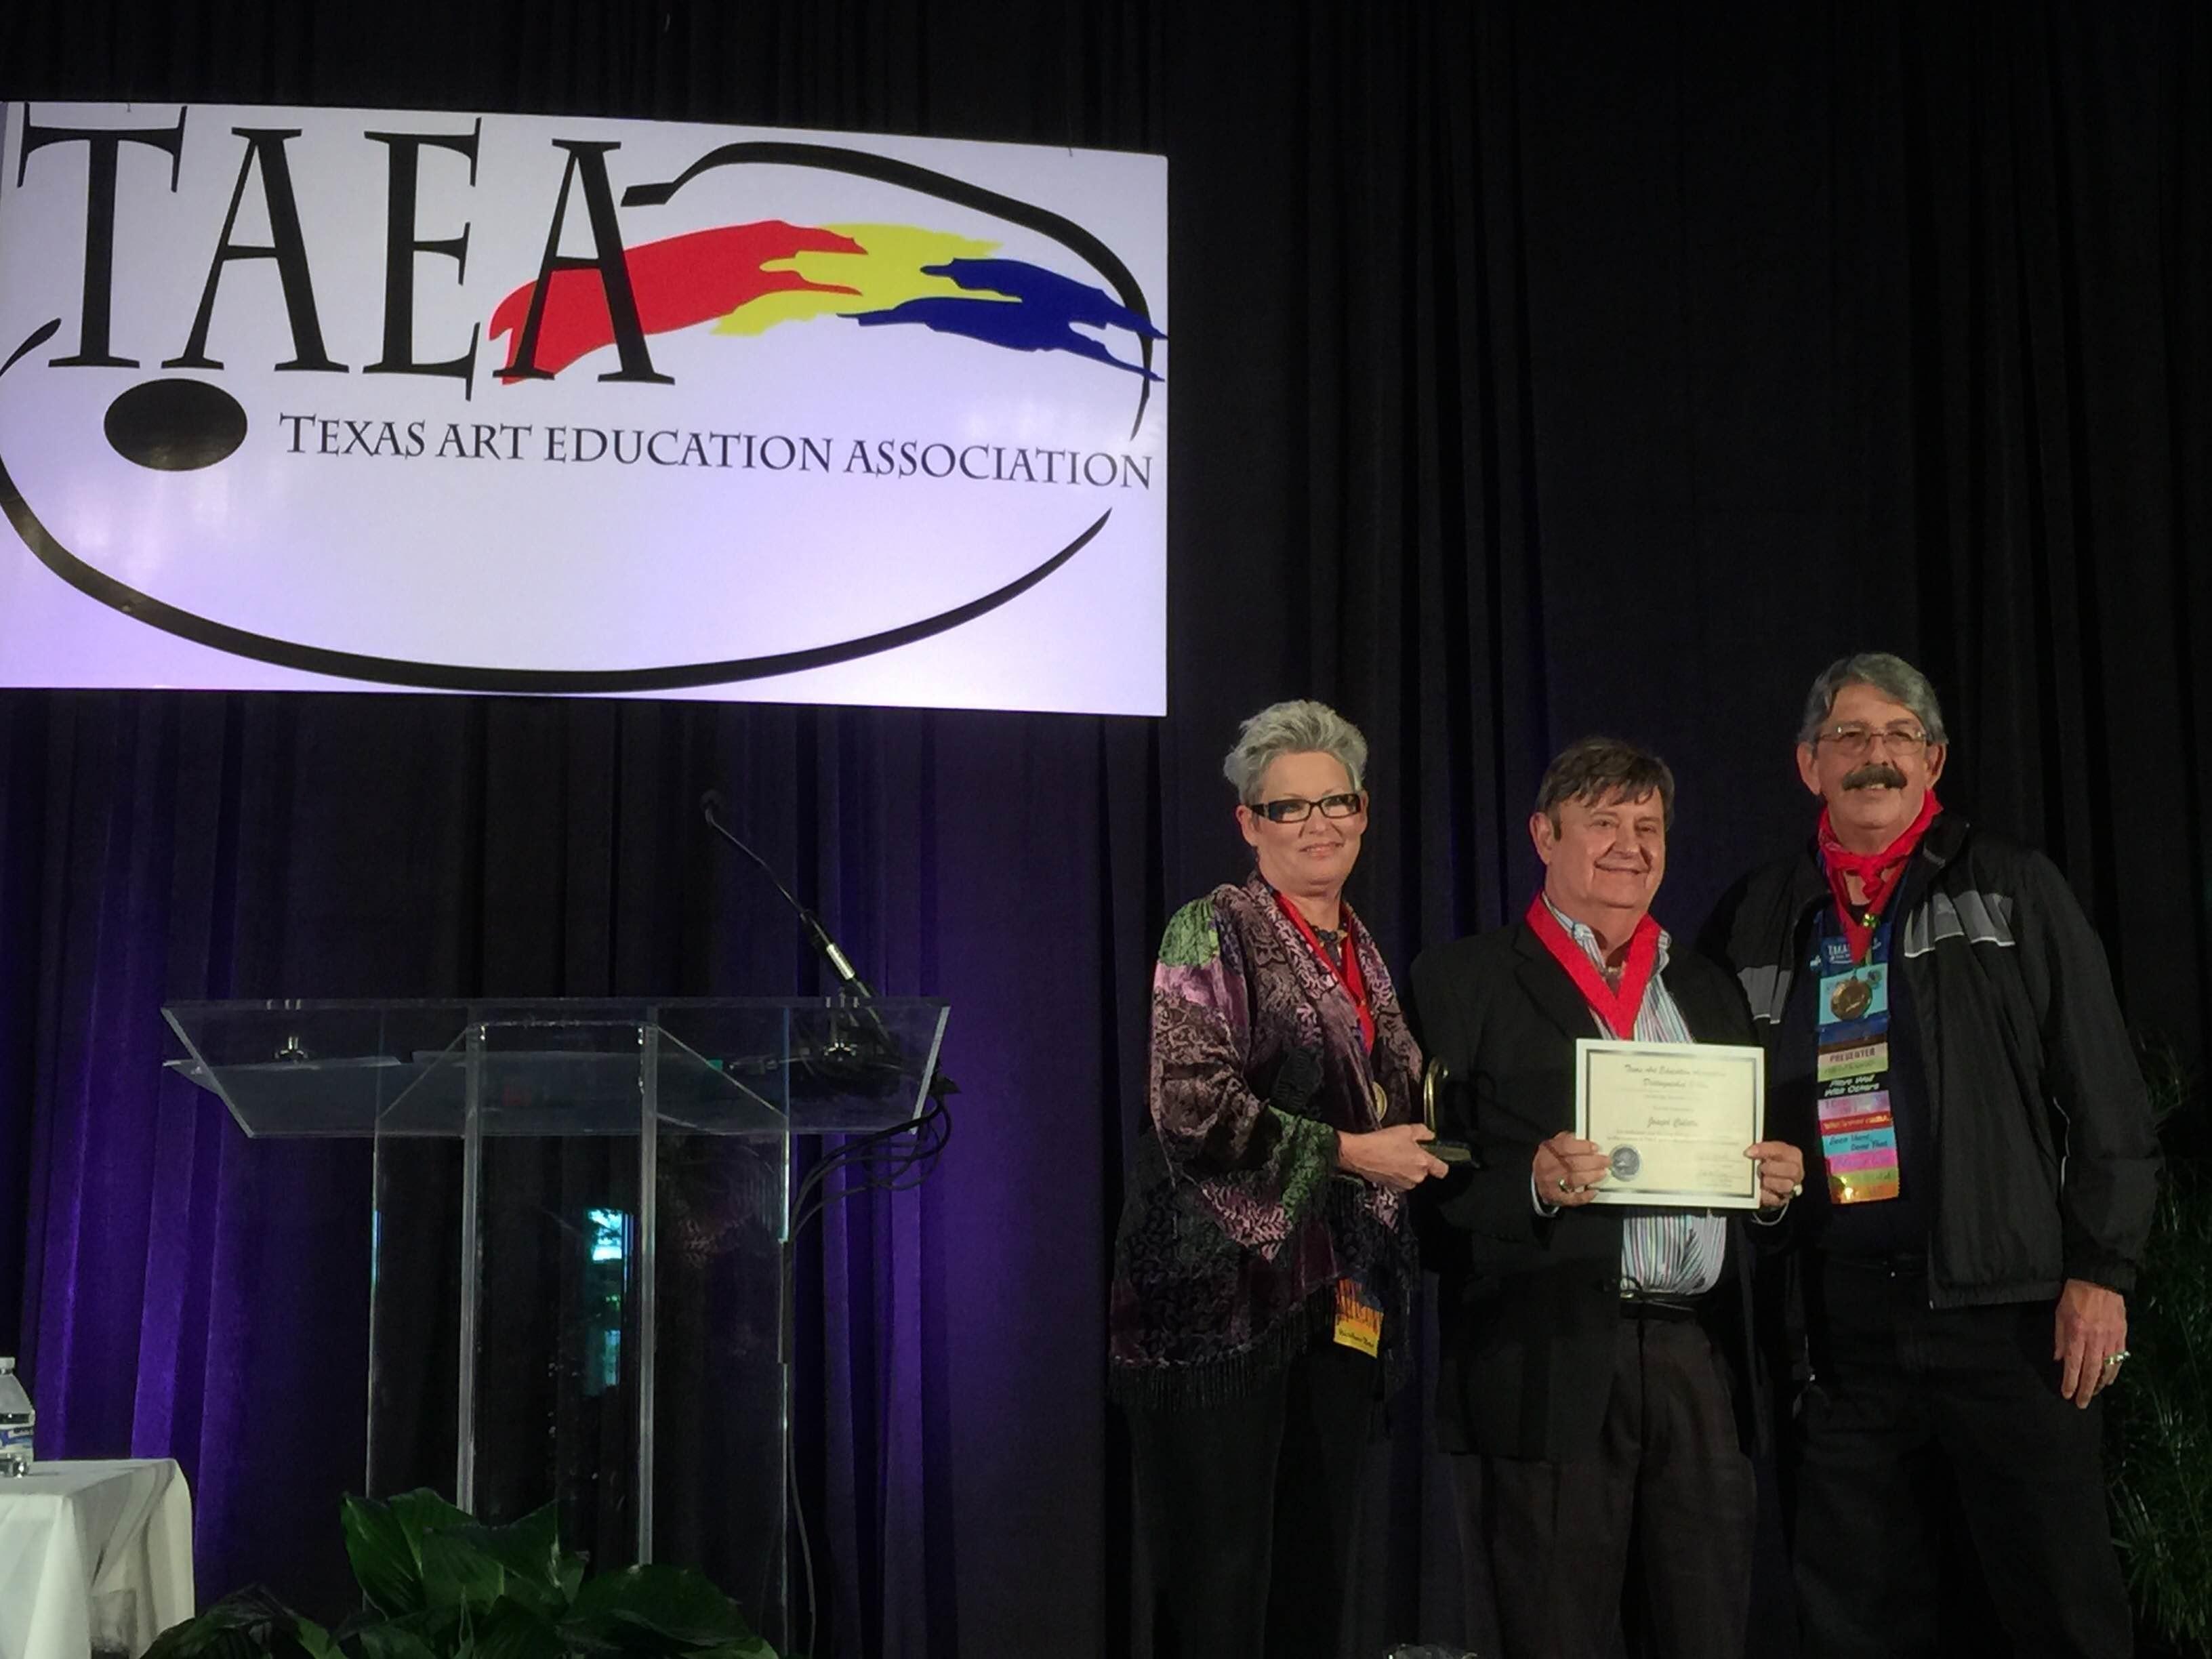 Artist Joseph Culotta, Dr. Tina Farrell, Robert Parker, Distinguished Fellow TAEA Texas Art Education Association (left to right Tina Farrell, Joseph Culotta, Robert Parker)